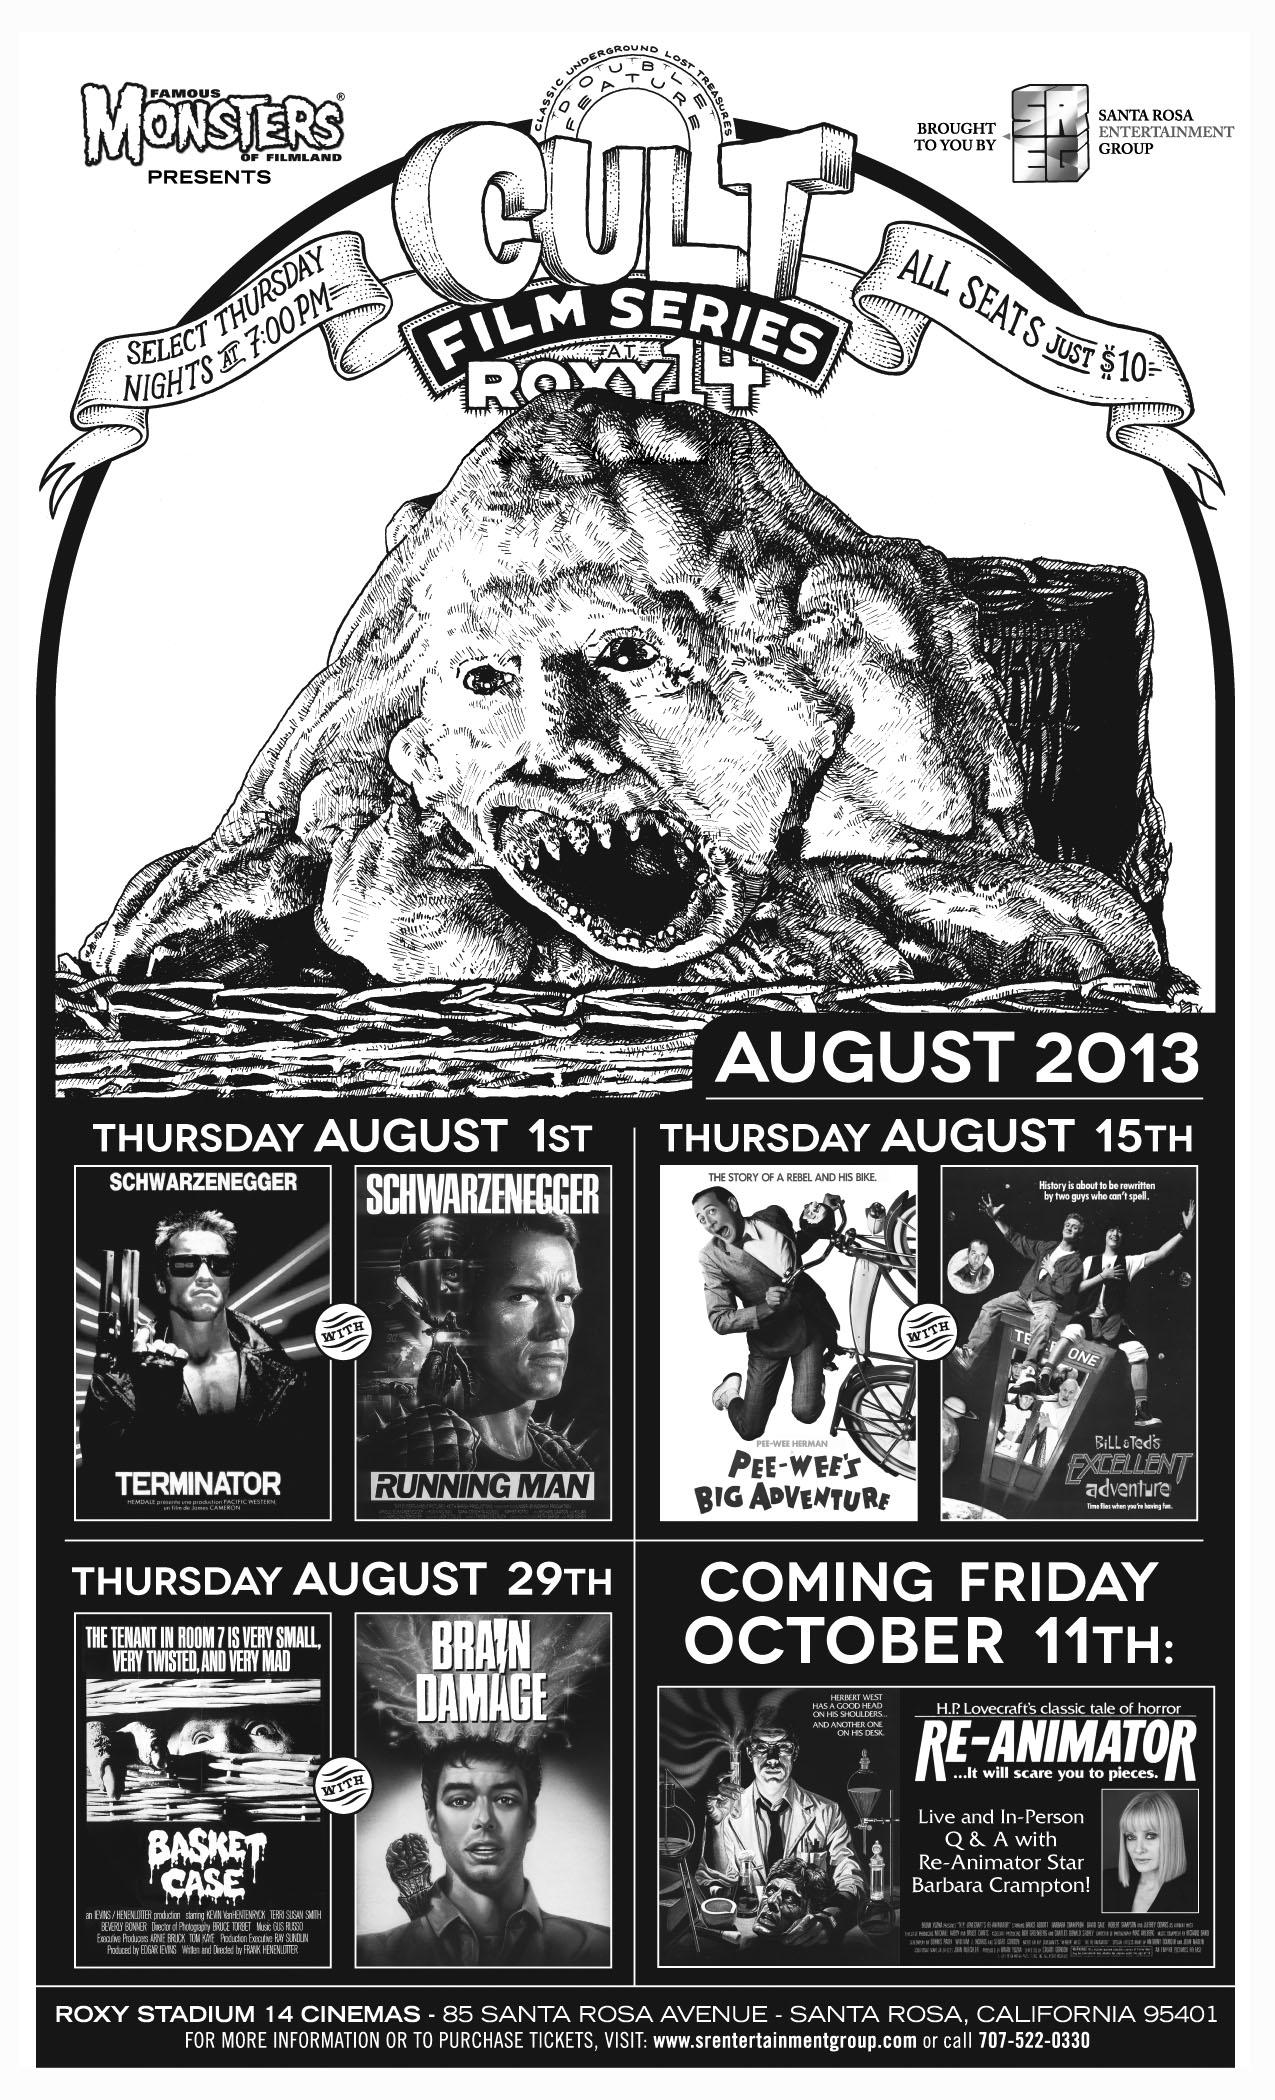 CULTmovie_Poster_close_August2013.jpg